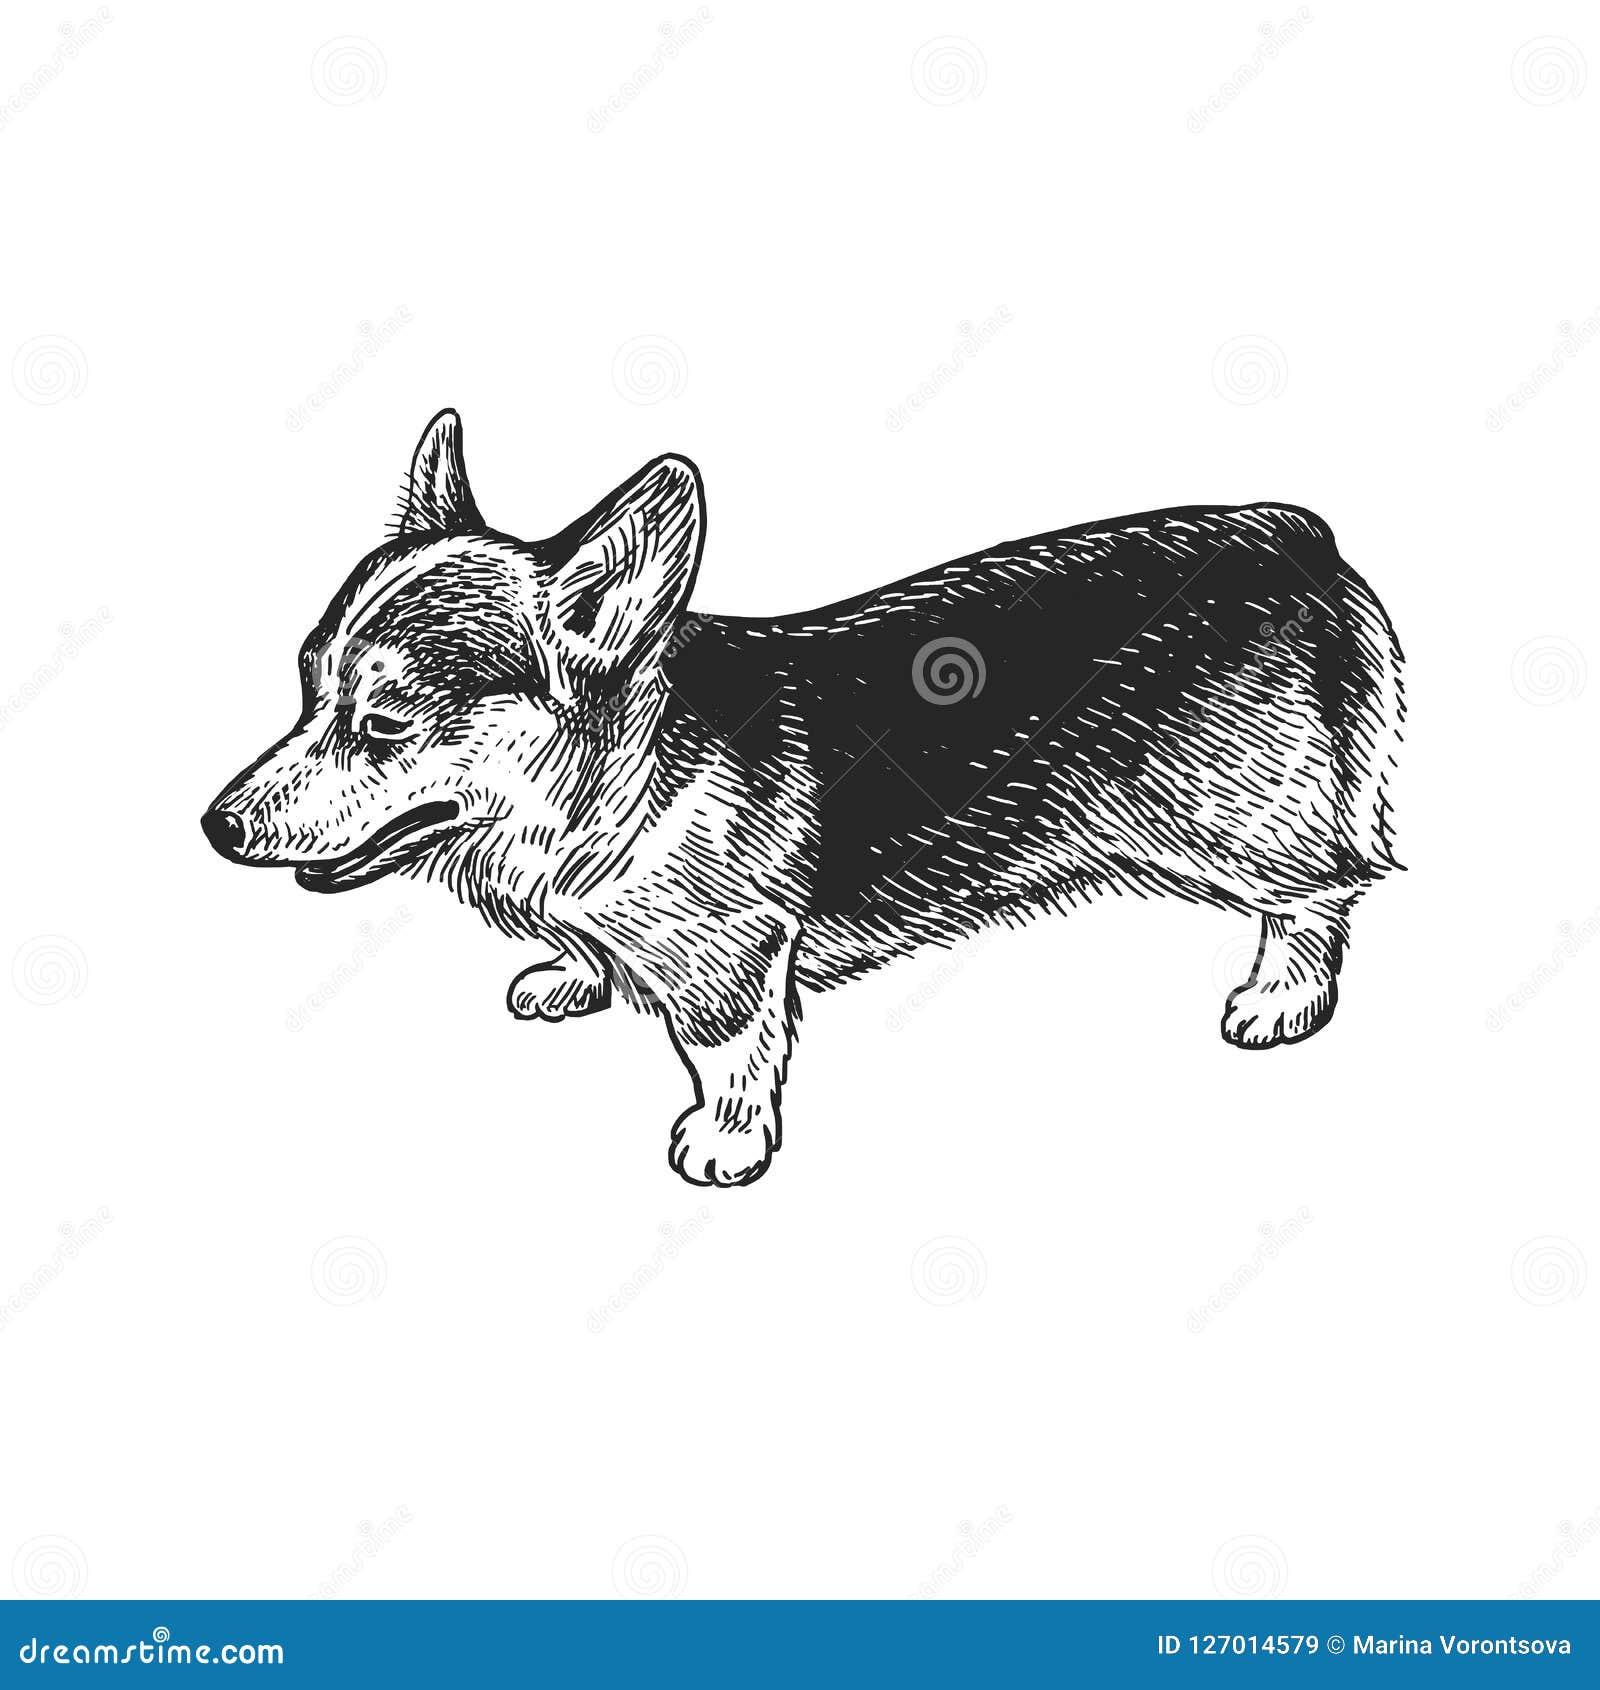 Dog Breed Corgi  Cute Puppy  Black And White Hand Drawing